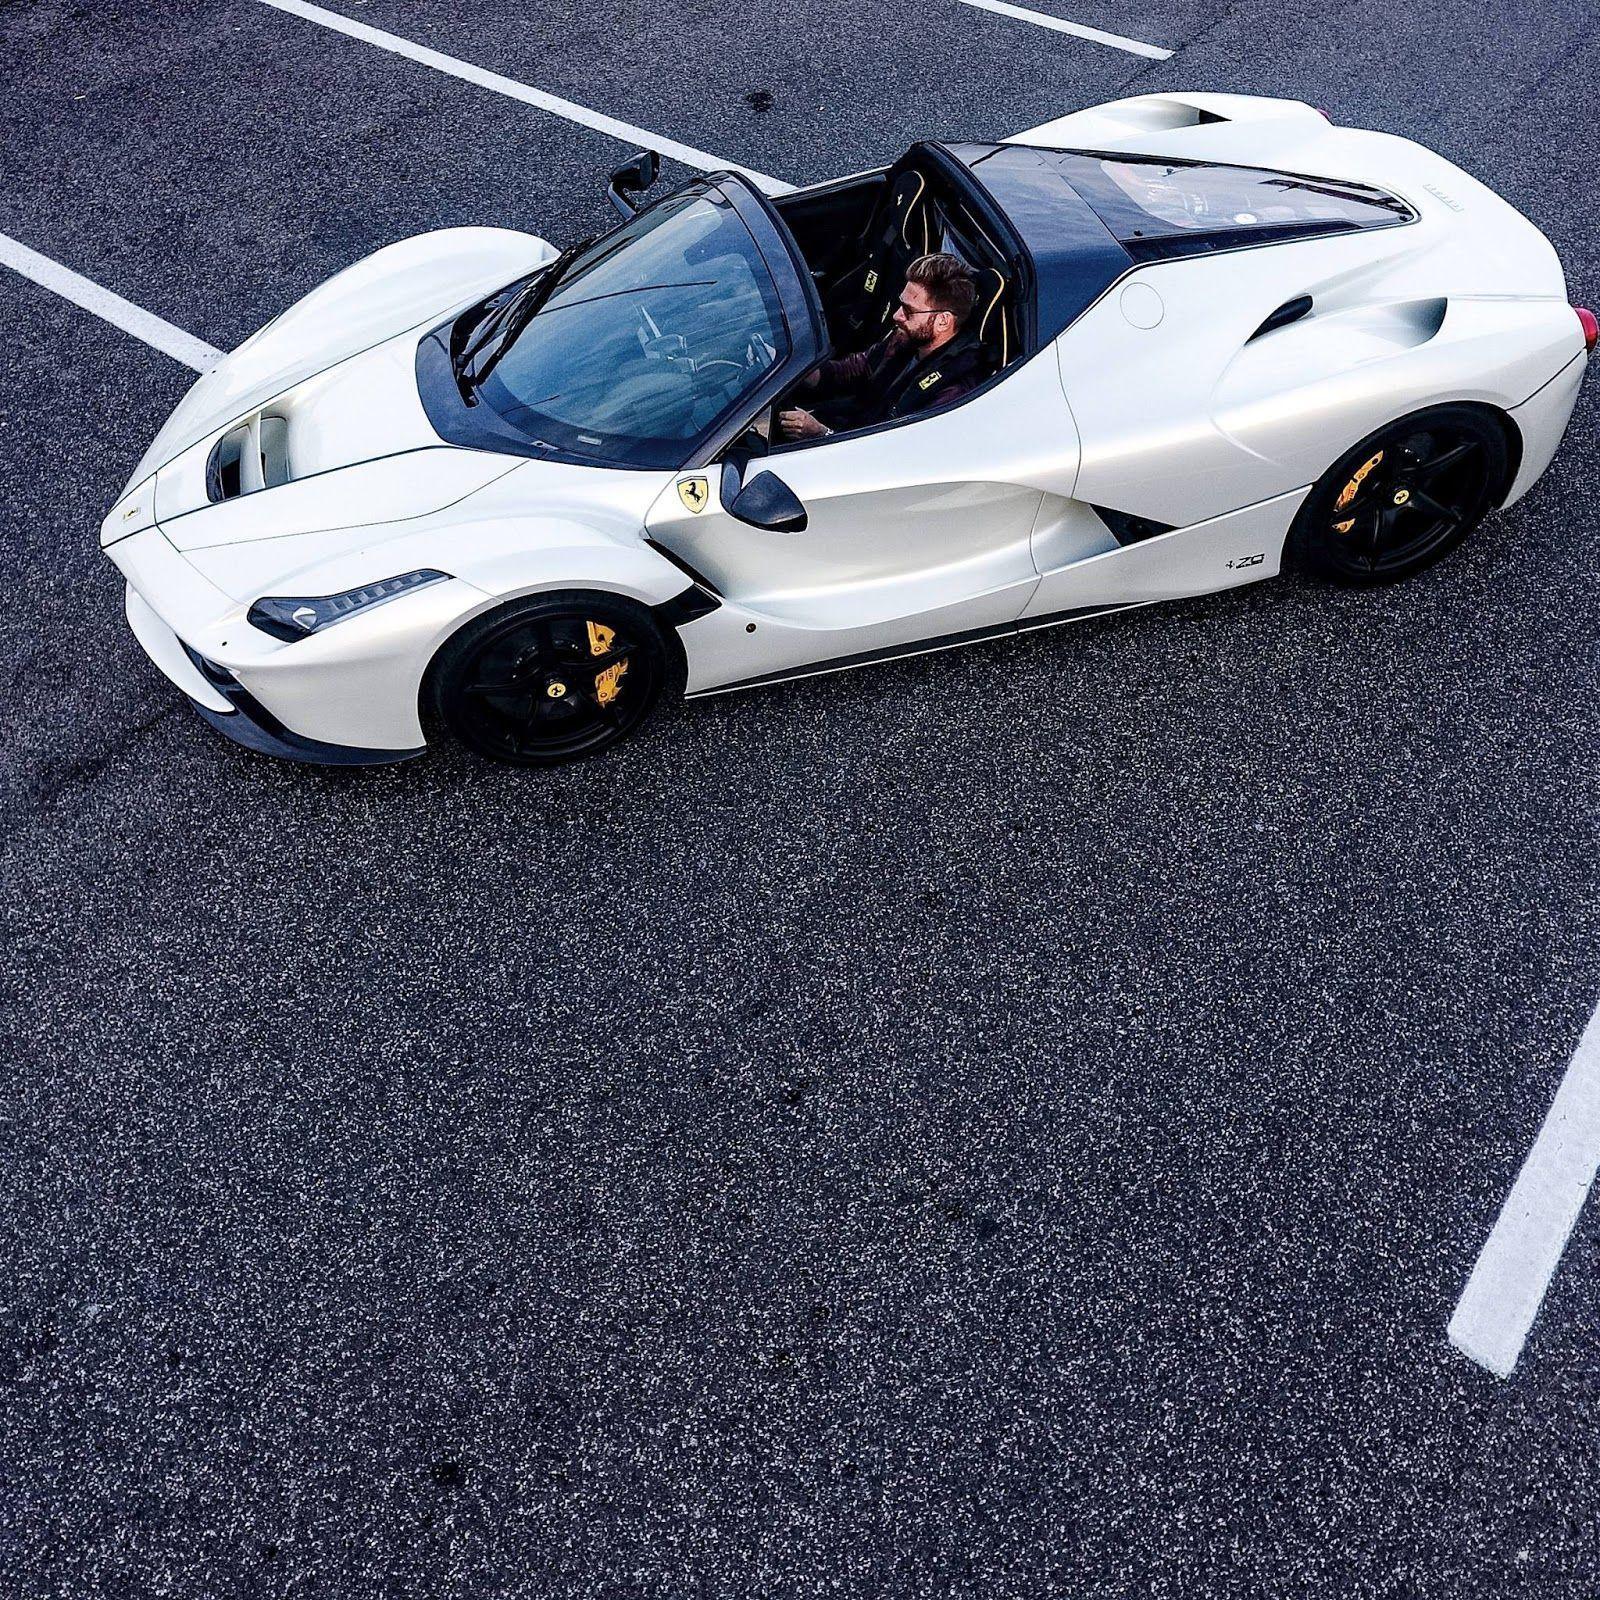 Josh Cartu S White Laferrari Aperta Is Simply Breathtaking Carscoops Ferrari Laferrari Sports Bikes Motorcycles Ferrari